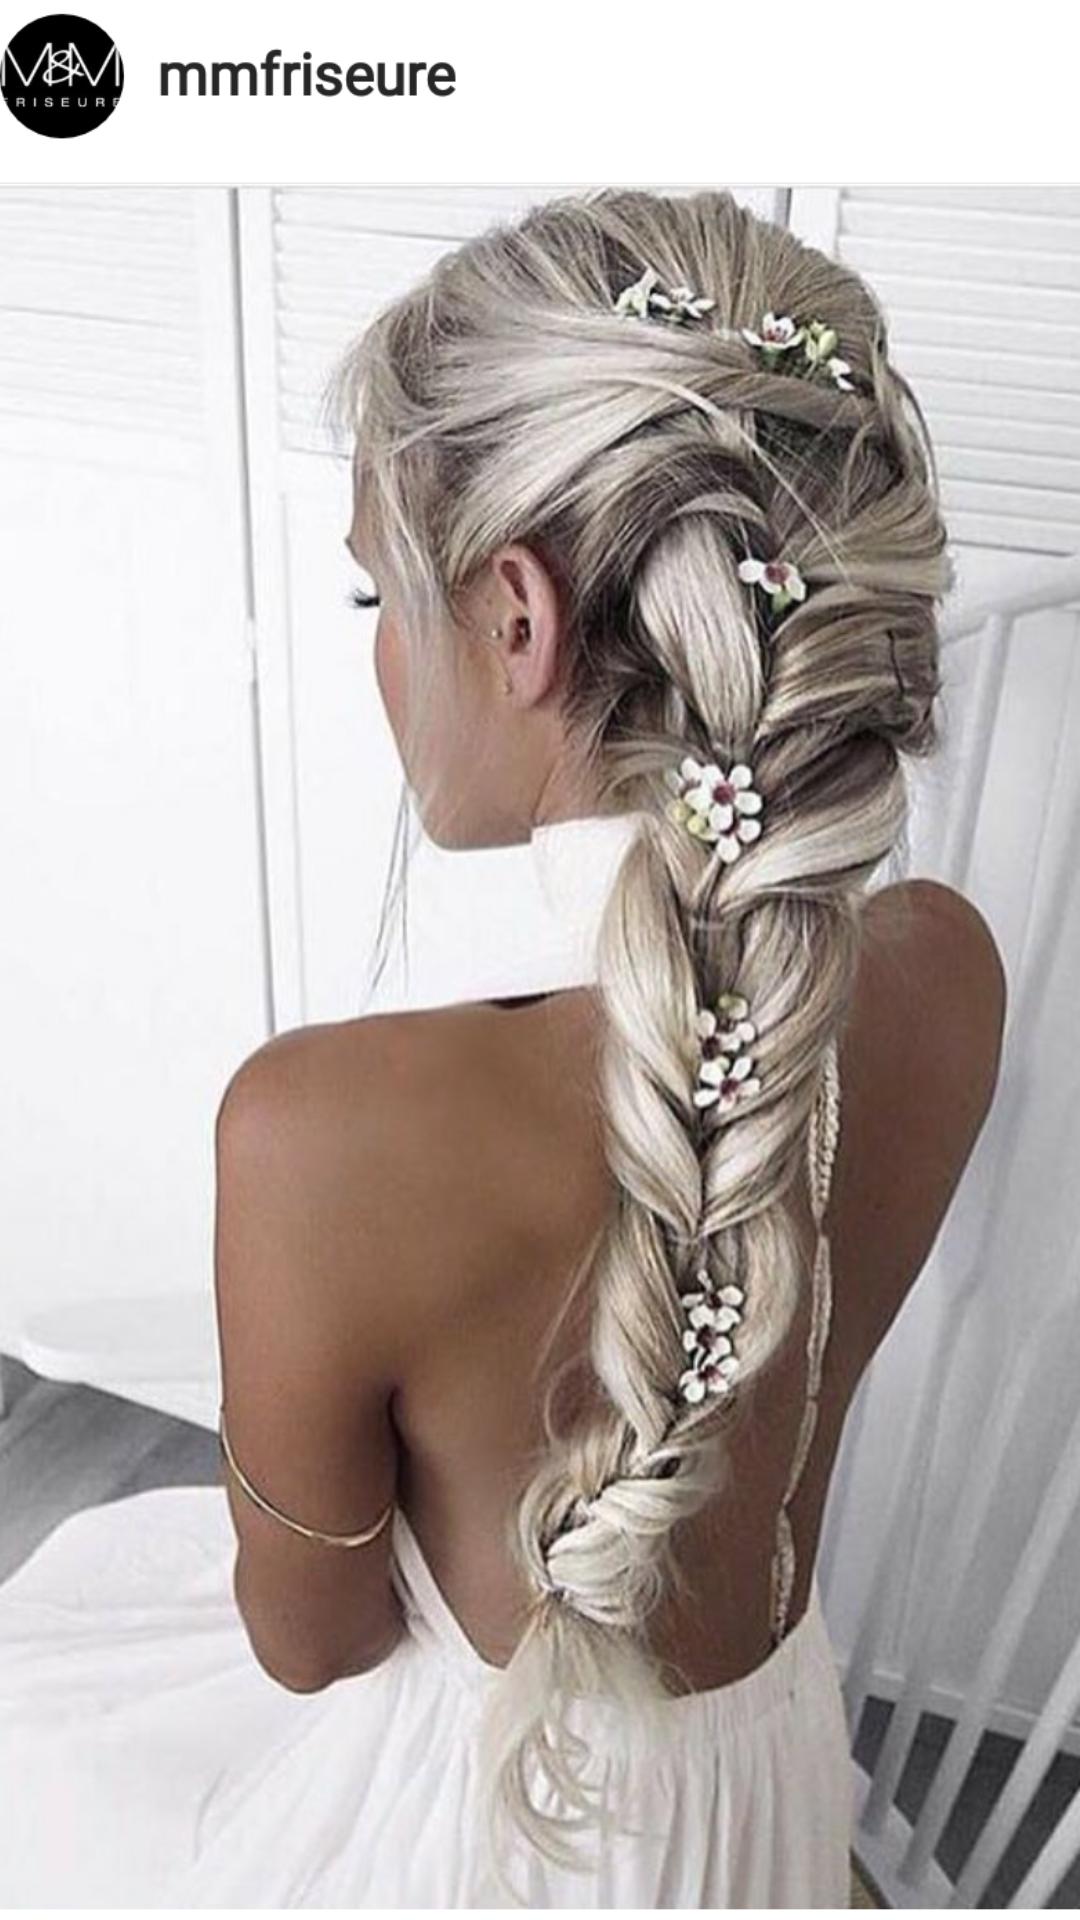 pinterest ☽ @lexximaloney | hair✄ | hair, hair styles